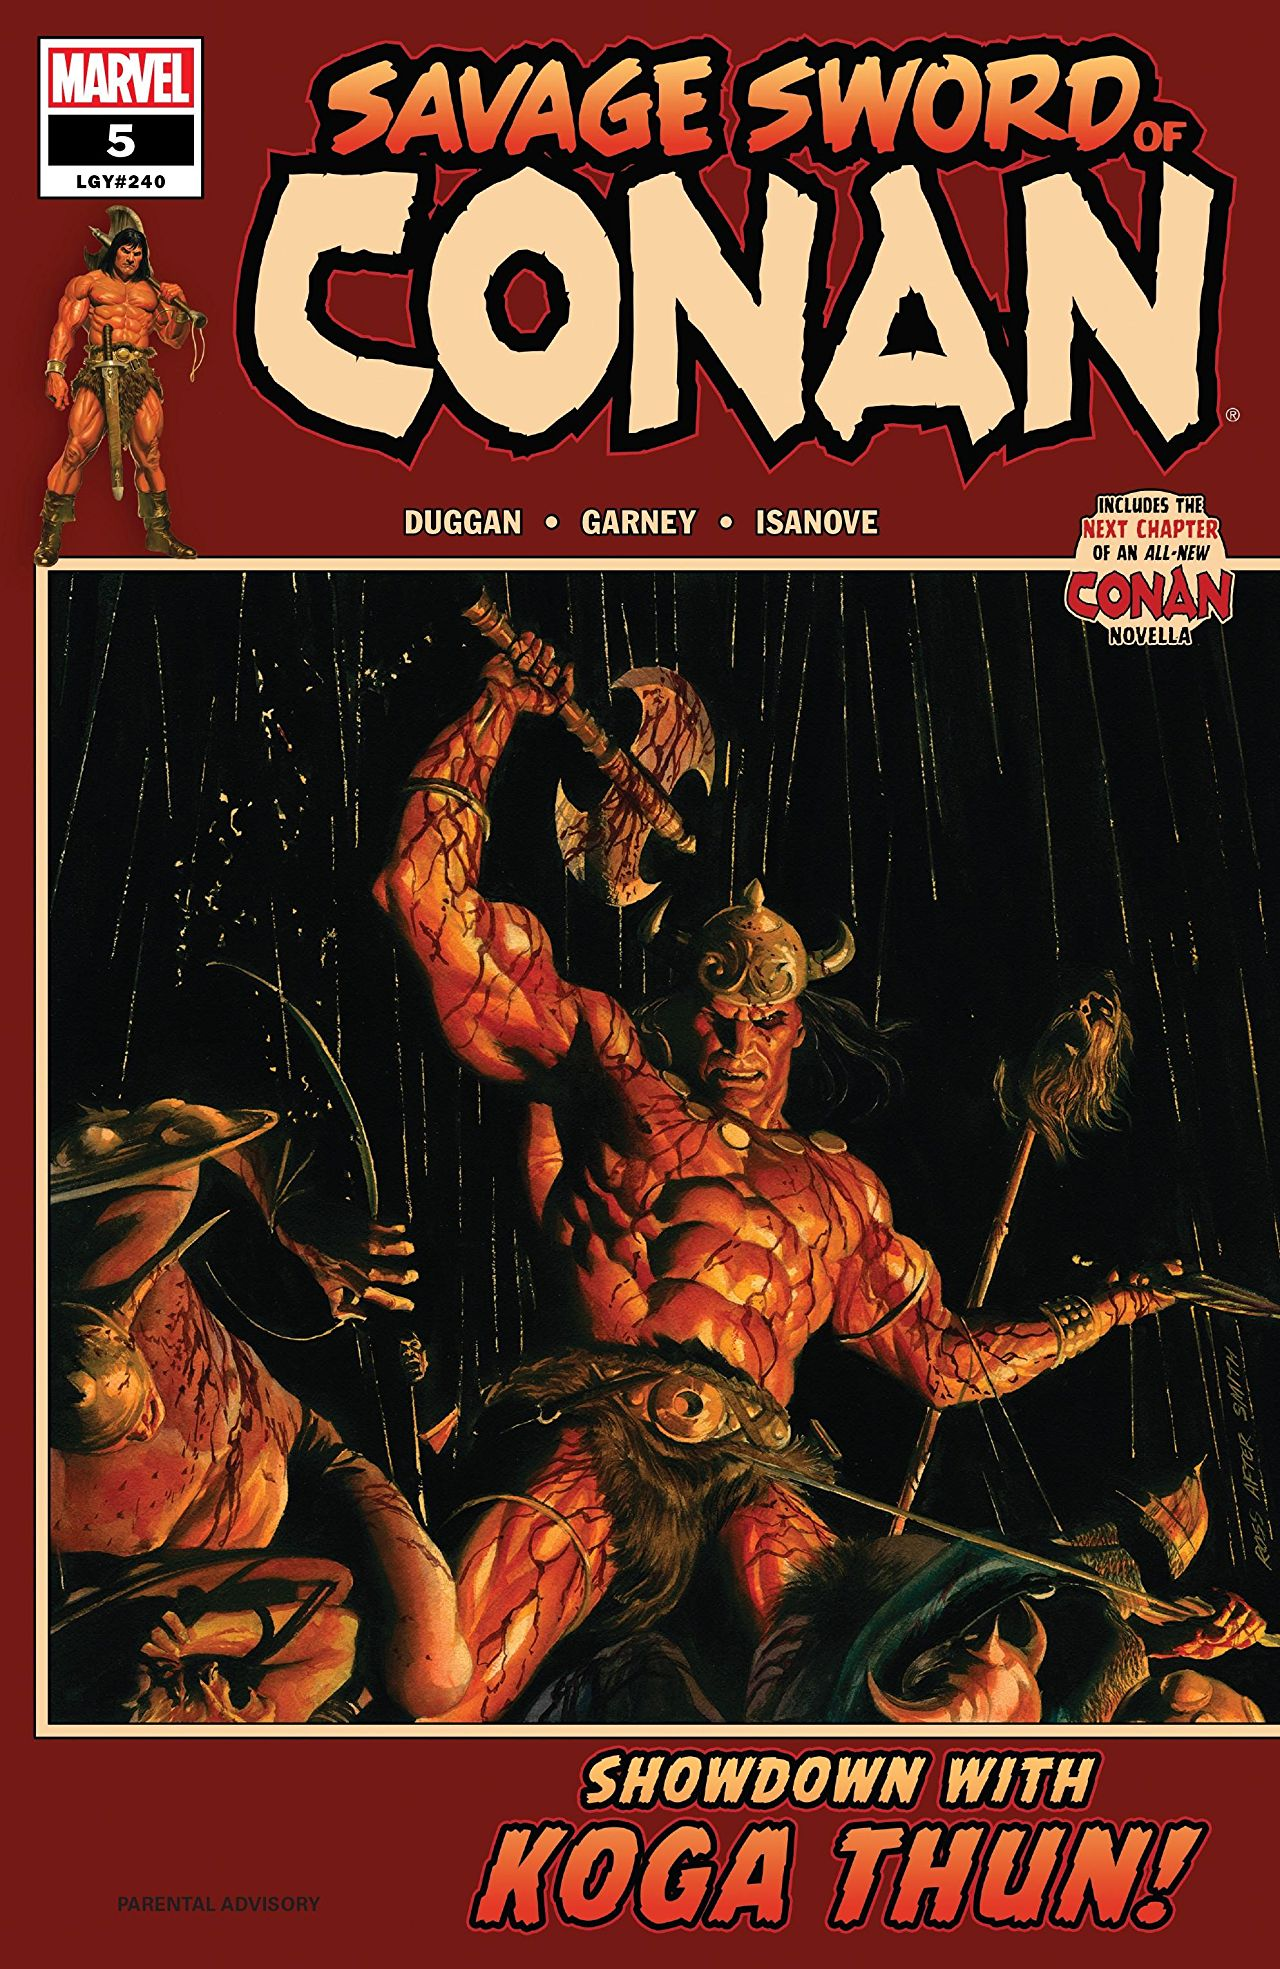 Savage Sword of Conan Vol. 1: The Cult of Koga Thun Review